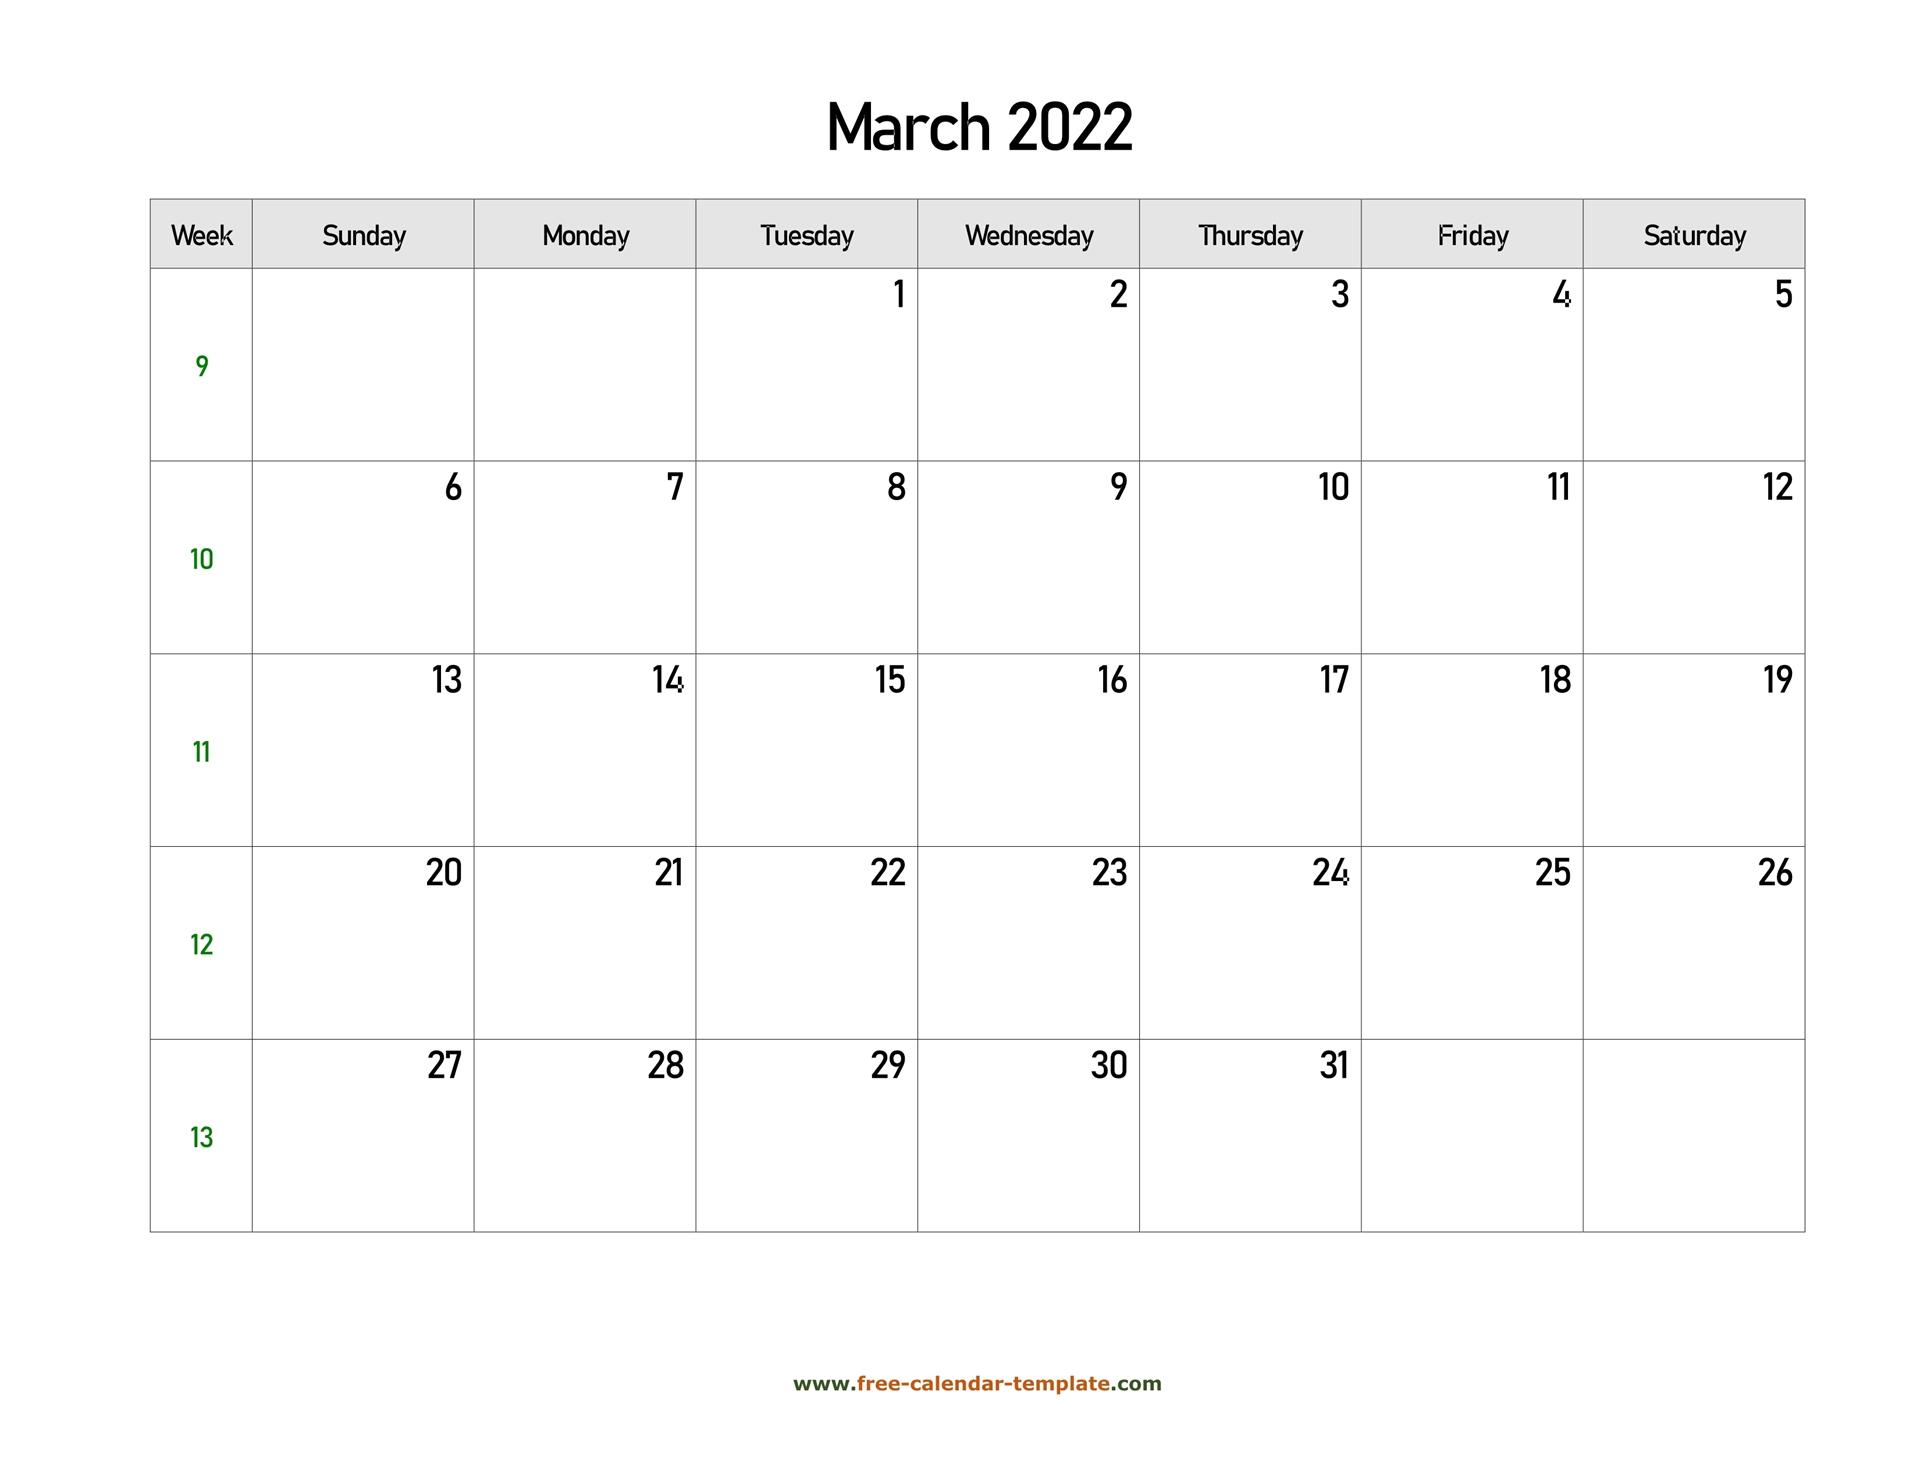 March 2022 Free Calendar Tempplate   Free Calendar In January 2022 Calendar Large Font